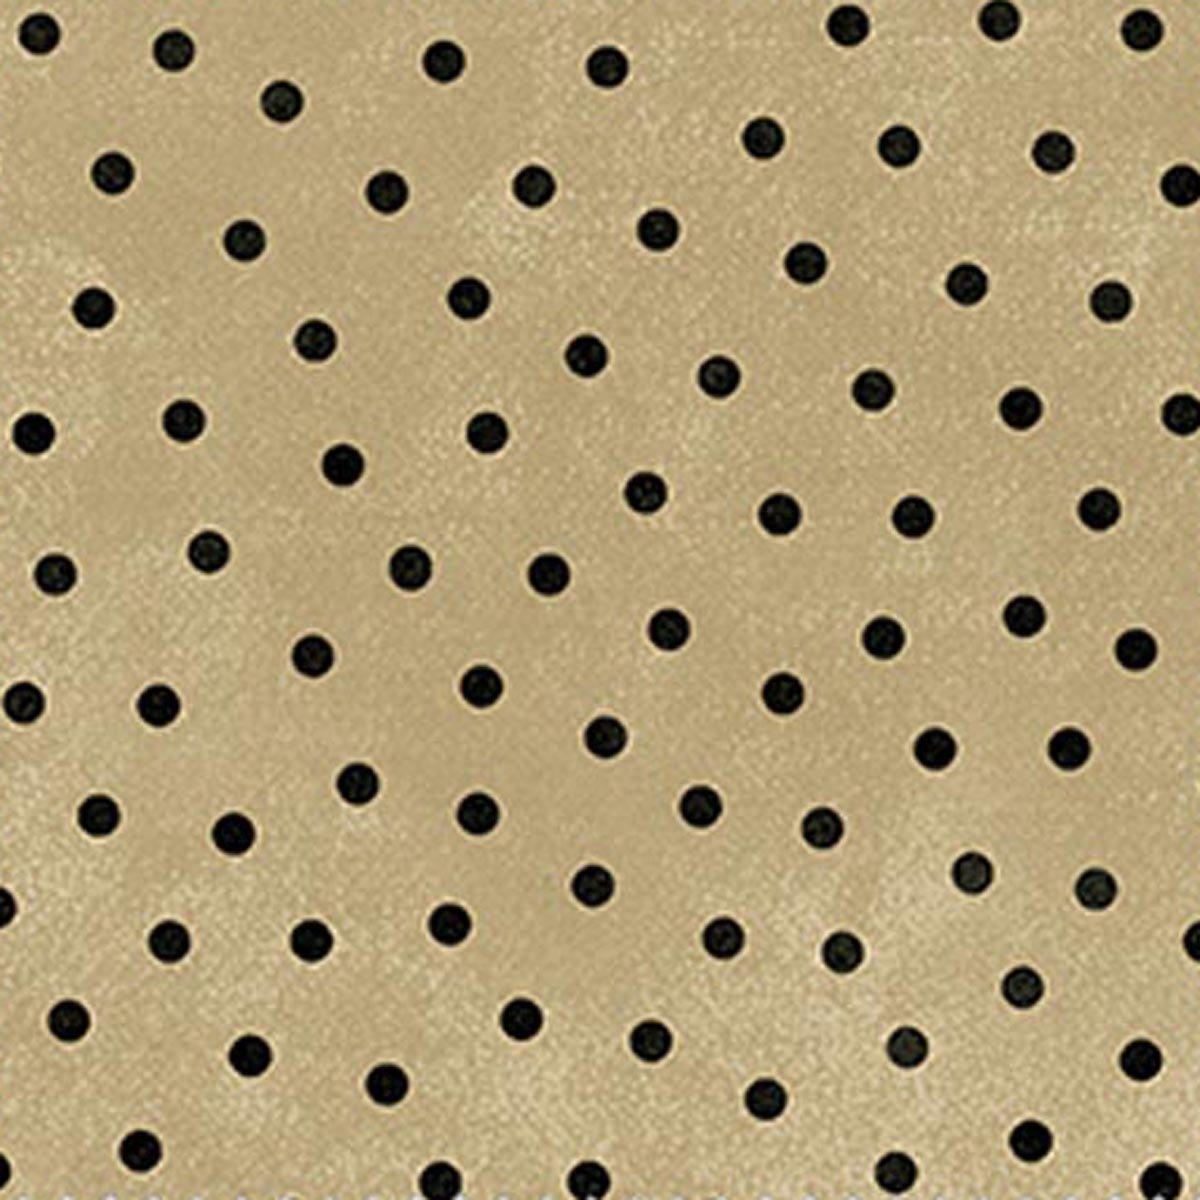 Woolies Flannel - MASF18506-TJ